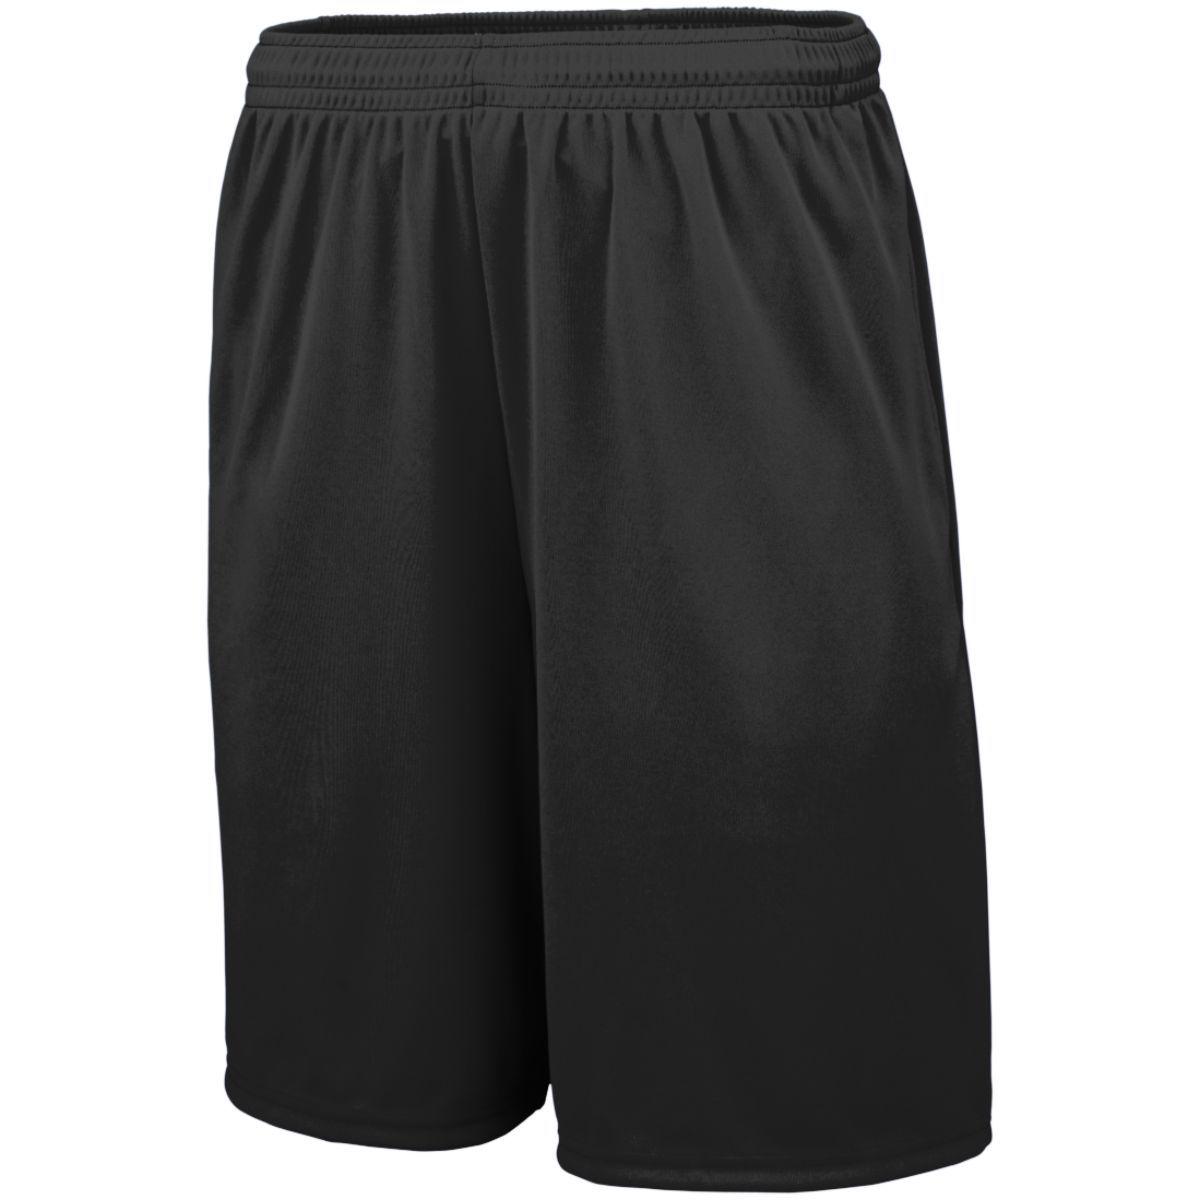 Training Shorts With Pockets - BLACK